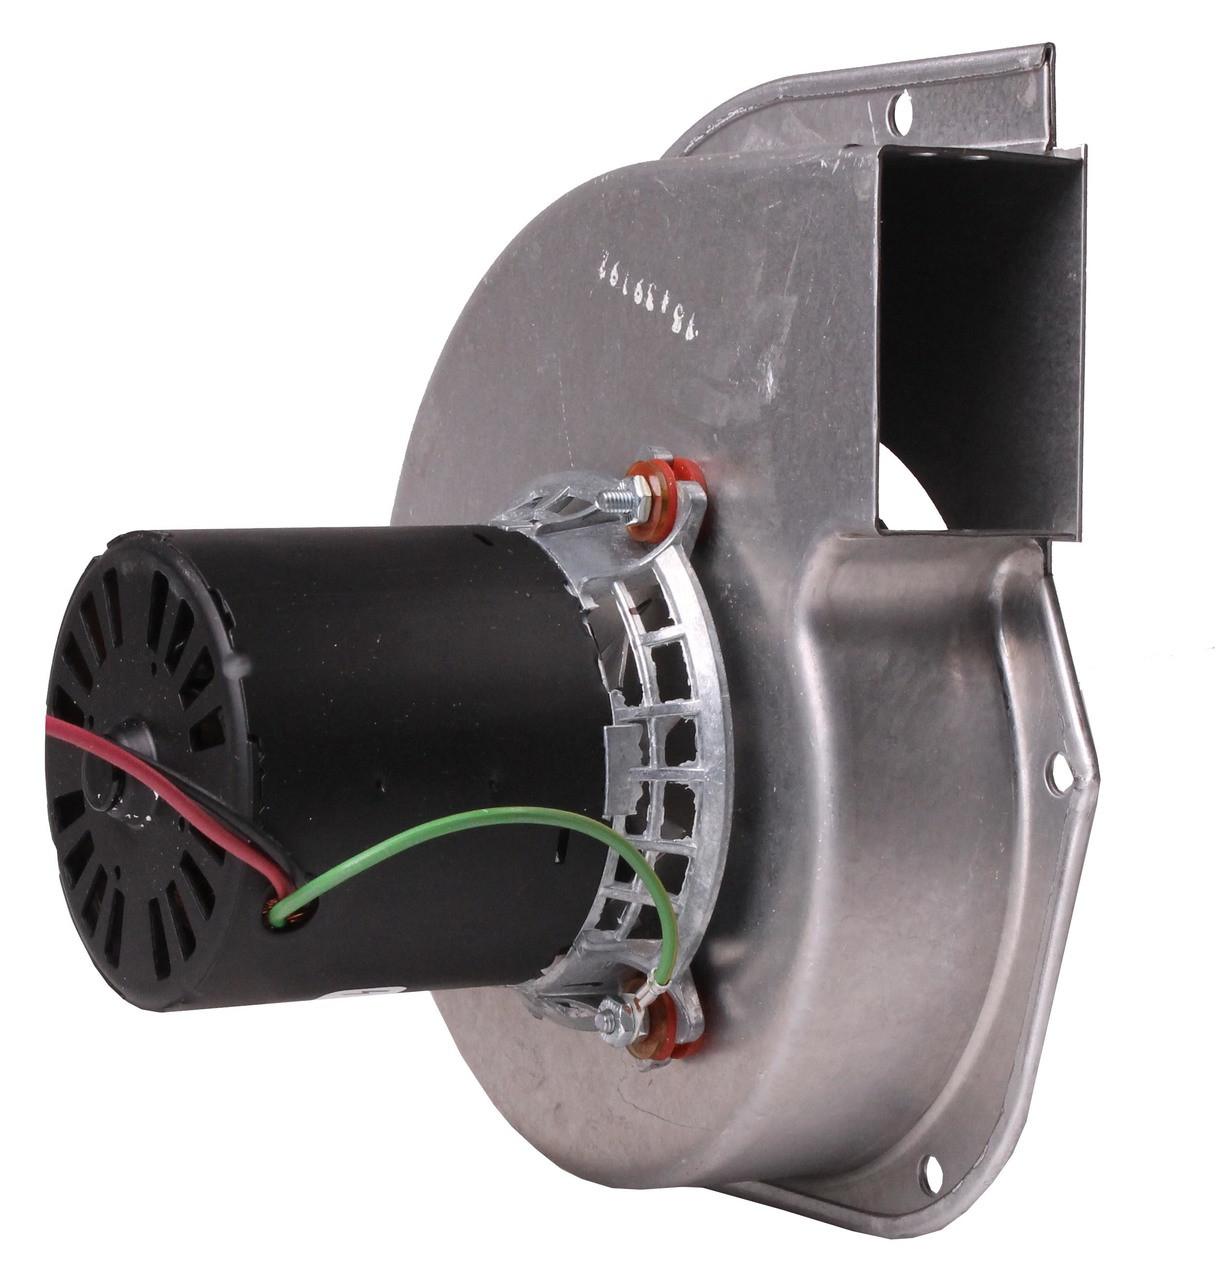 fasco a150 trane furnace draft inducer blower x38080029010 208 230 volts